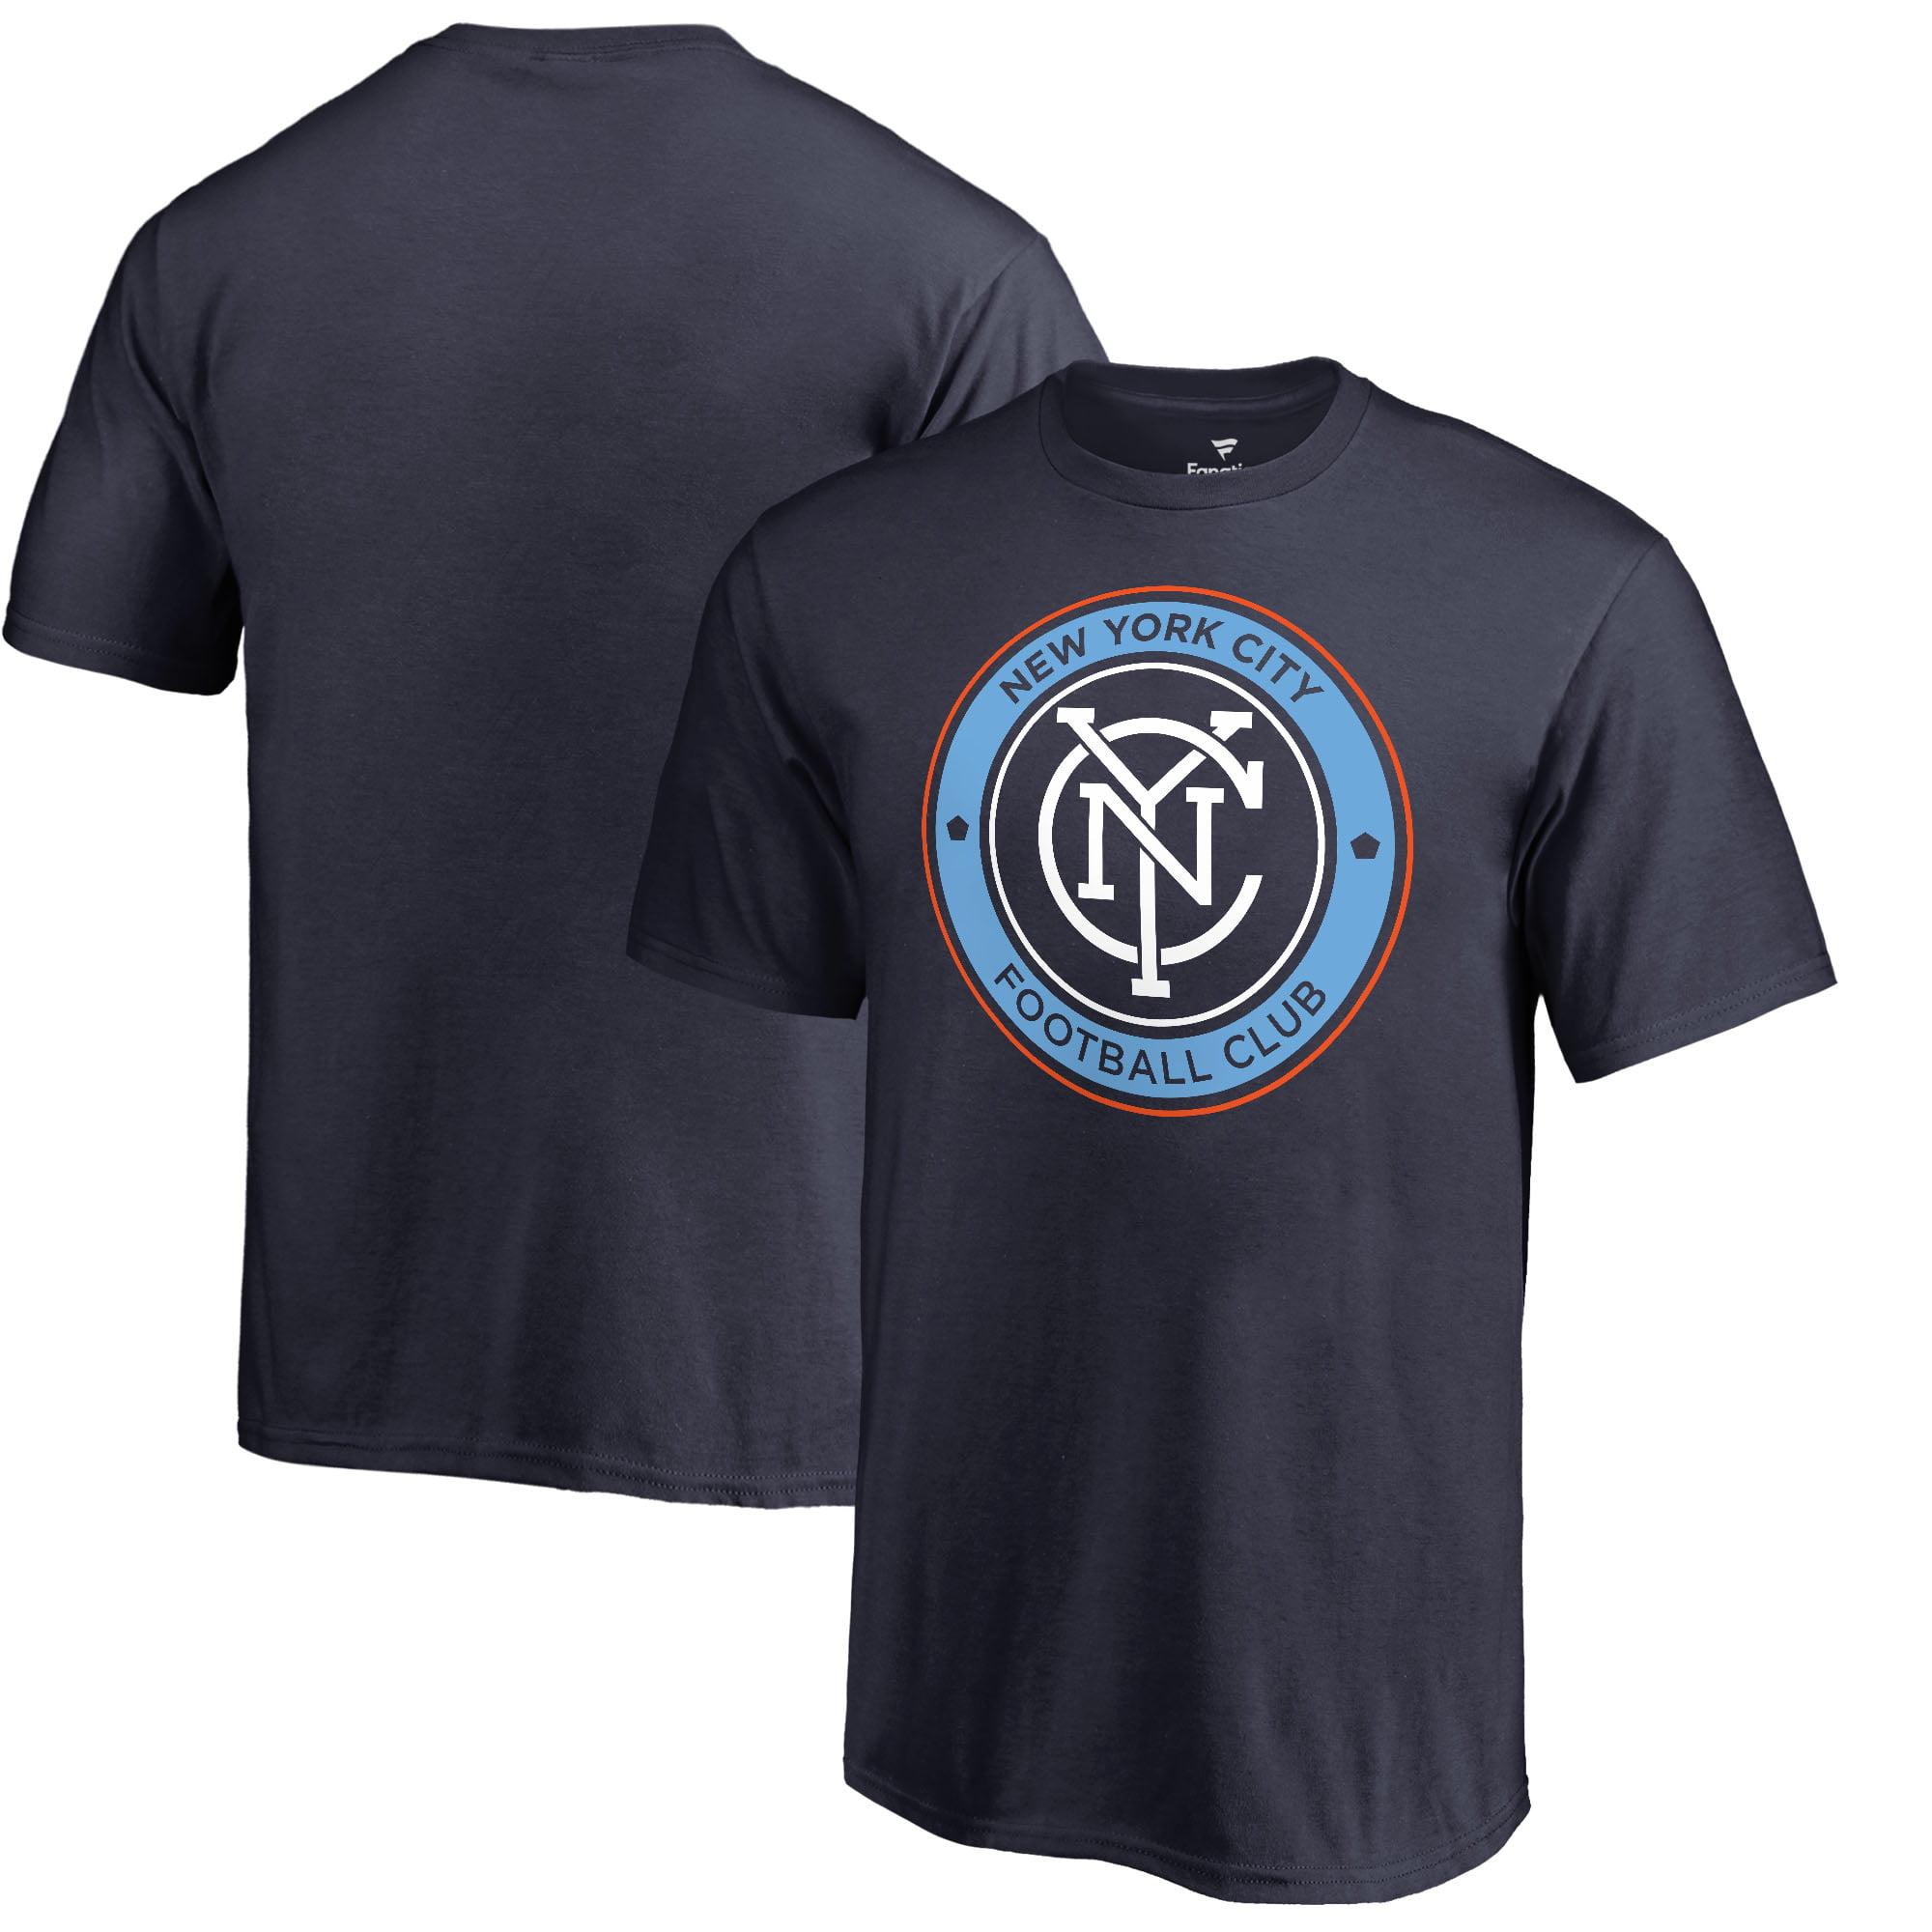 New York City FC Fanatics Branded Youth Primary Logo T-Shirt - Navy